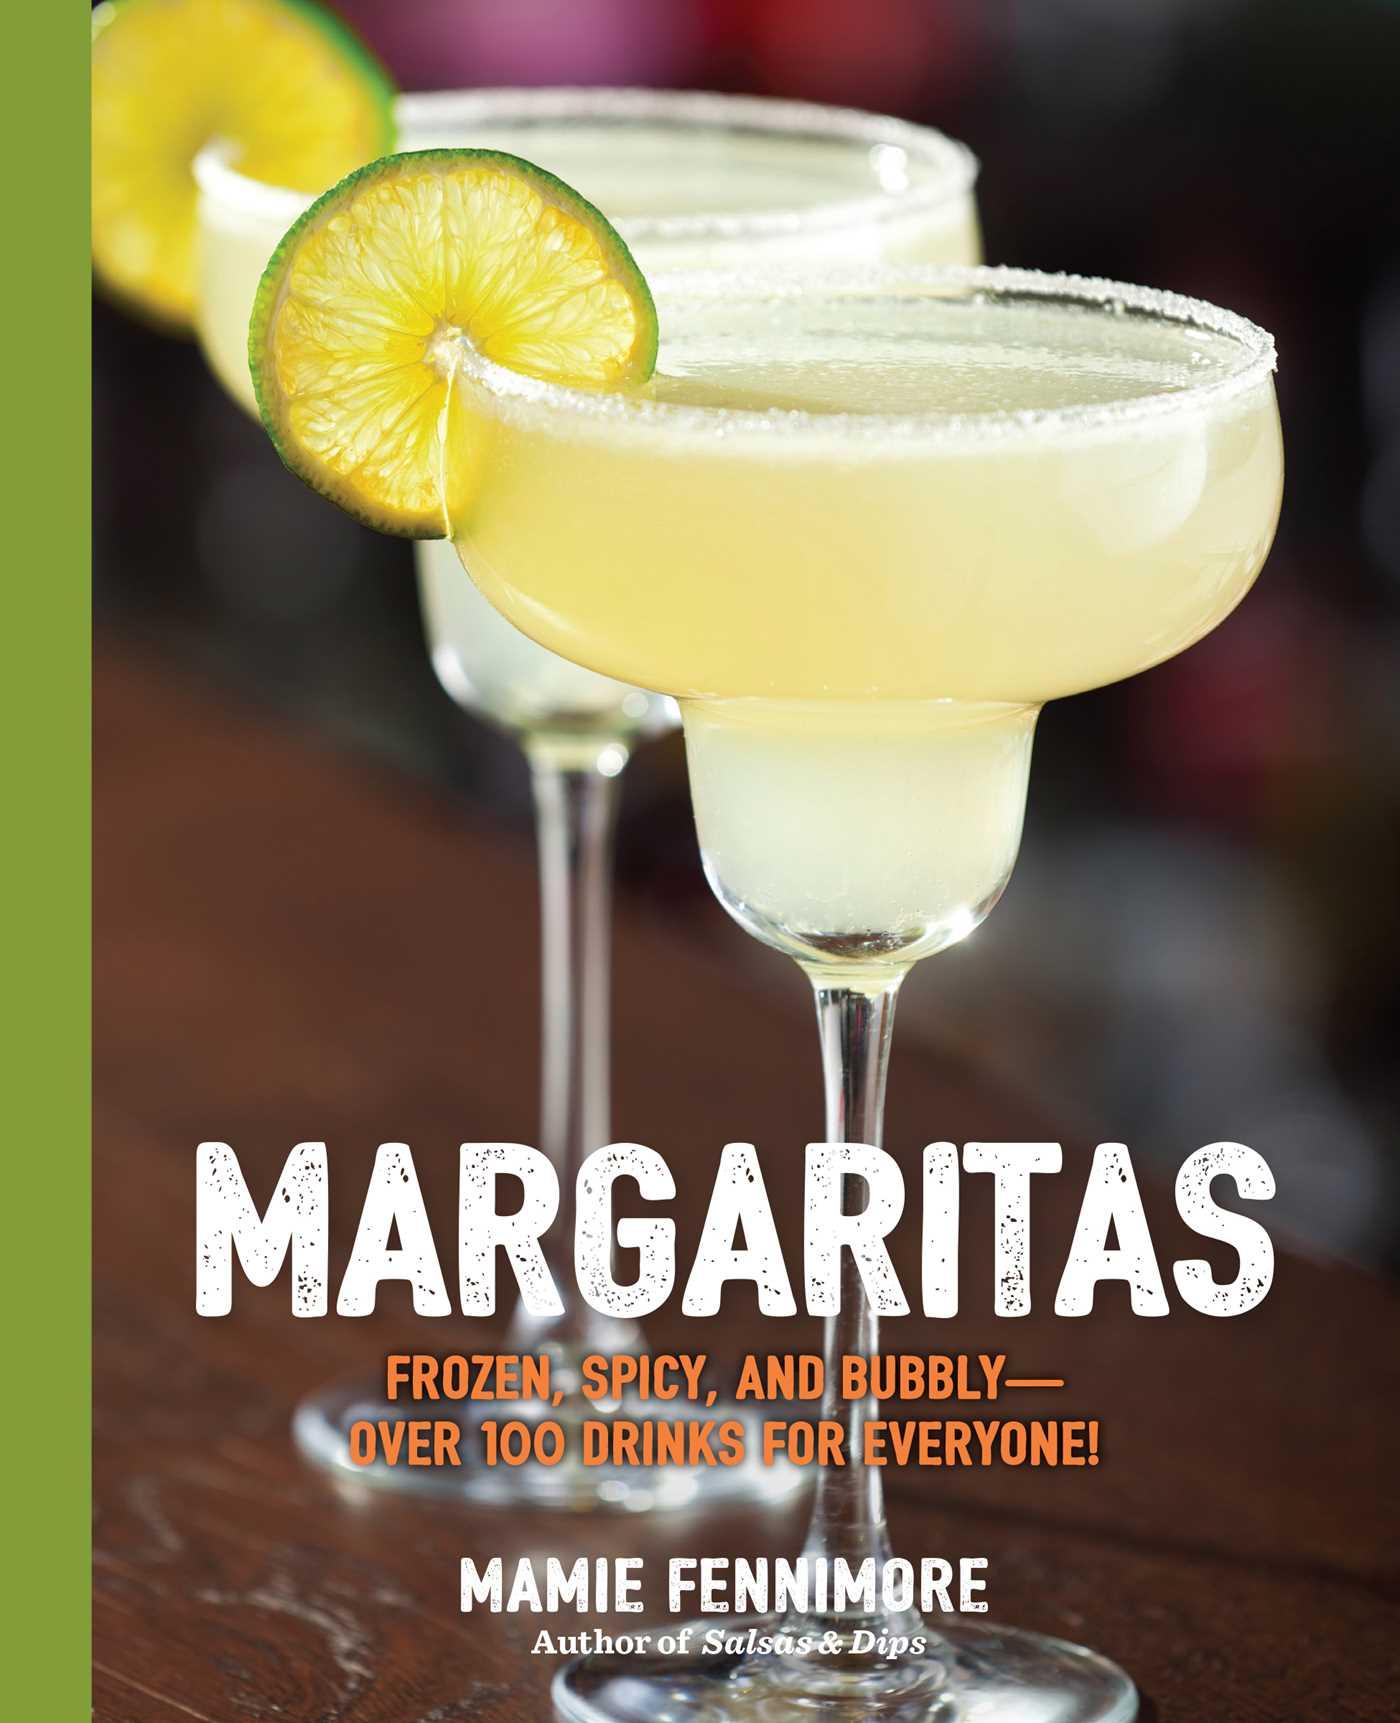 Margaritas 9781604337952 hr